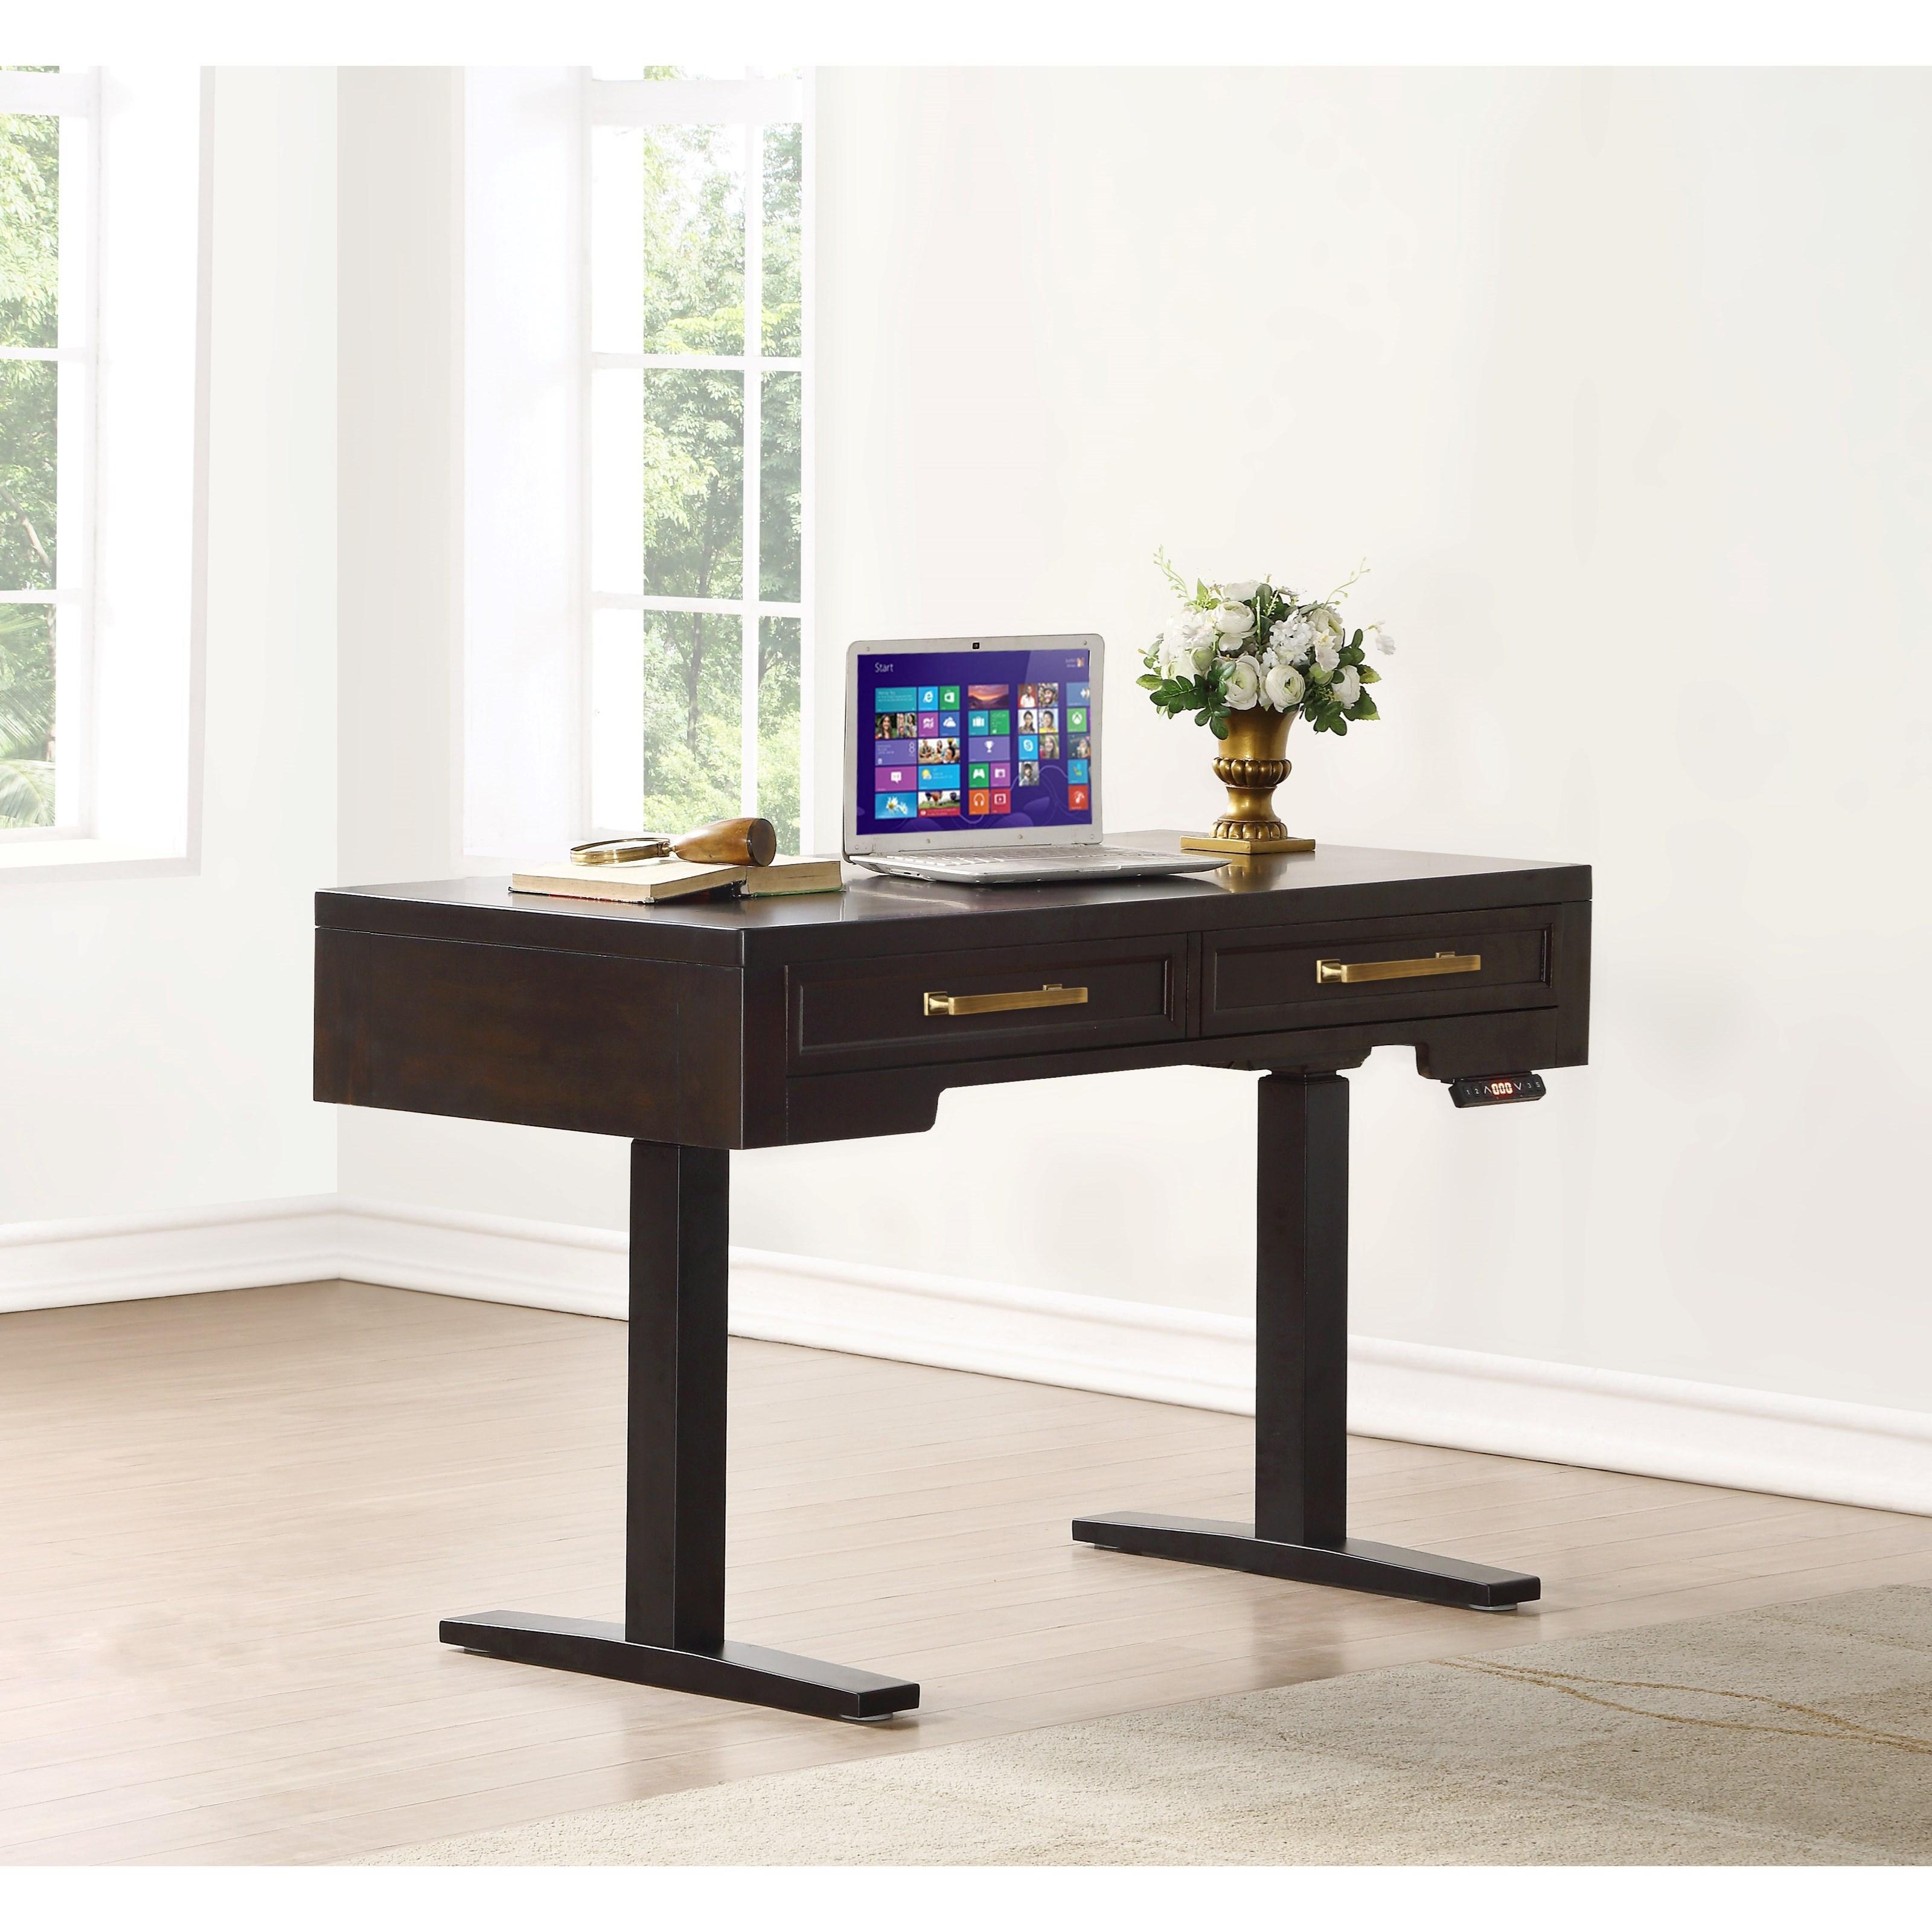 Power Lift Desk Top & Base